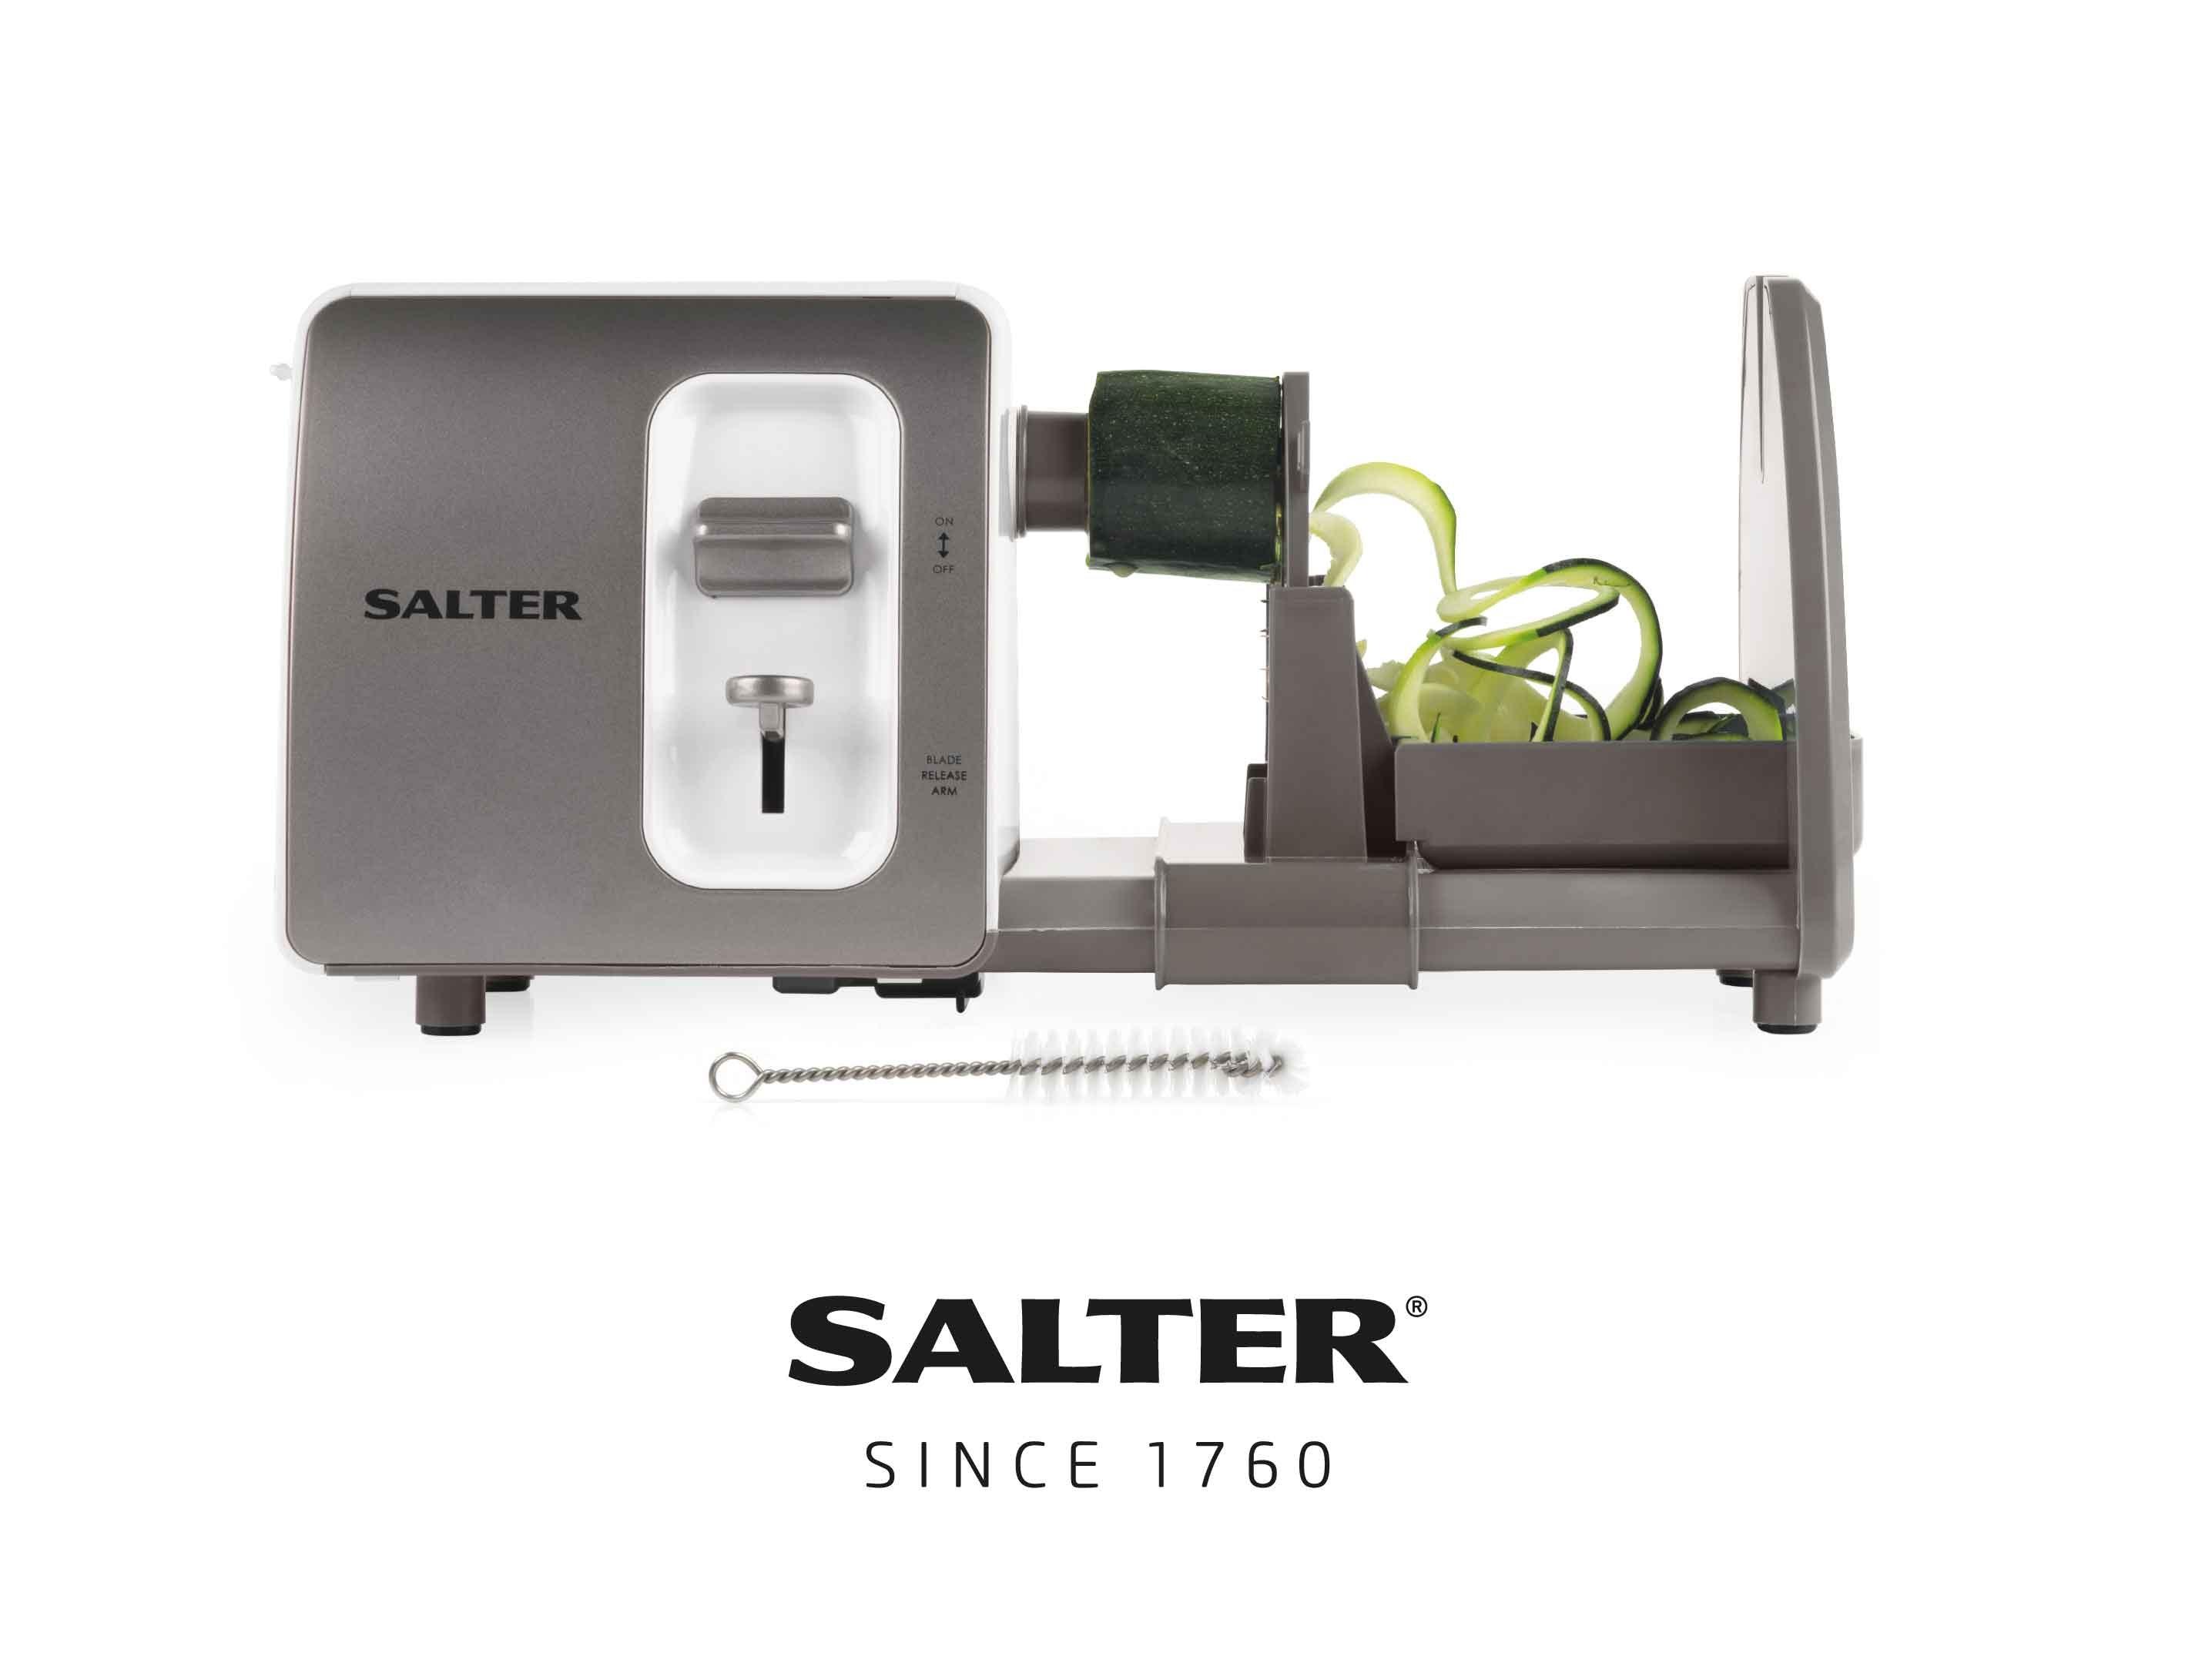 Ssalter2